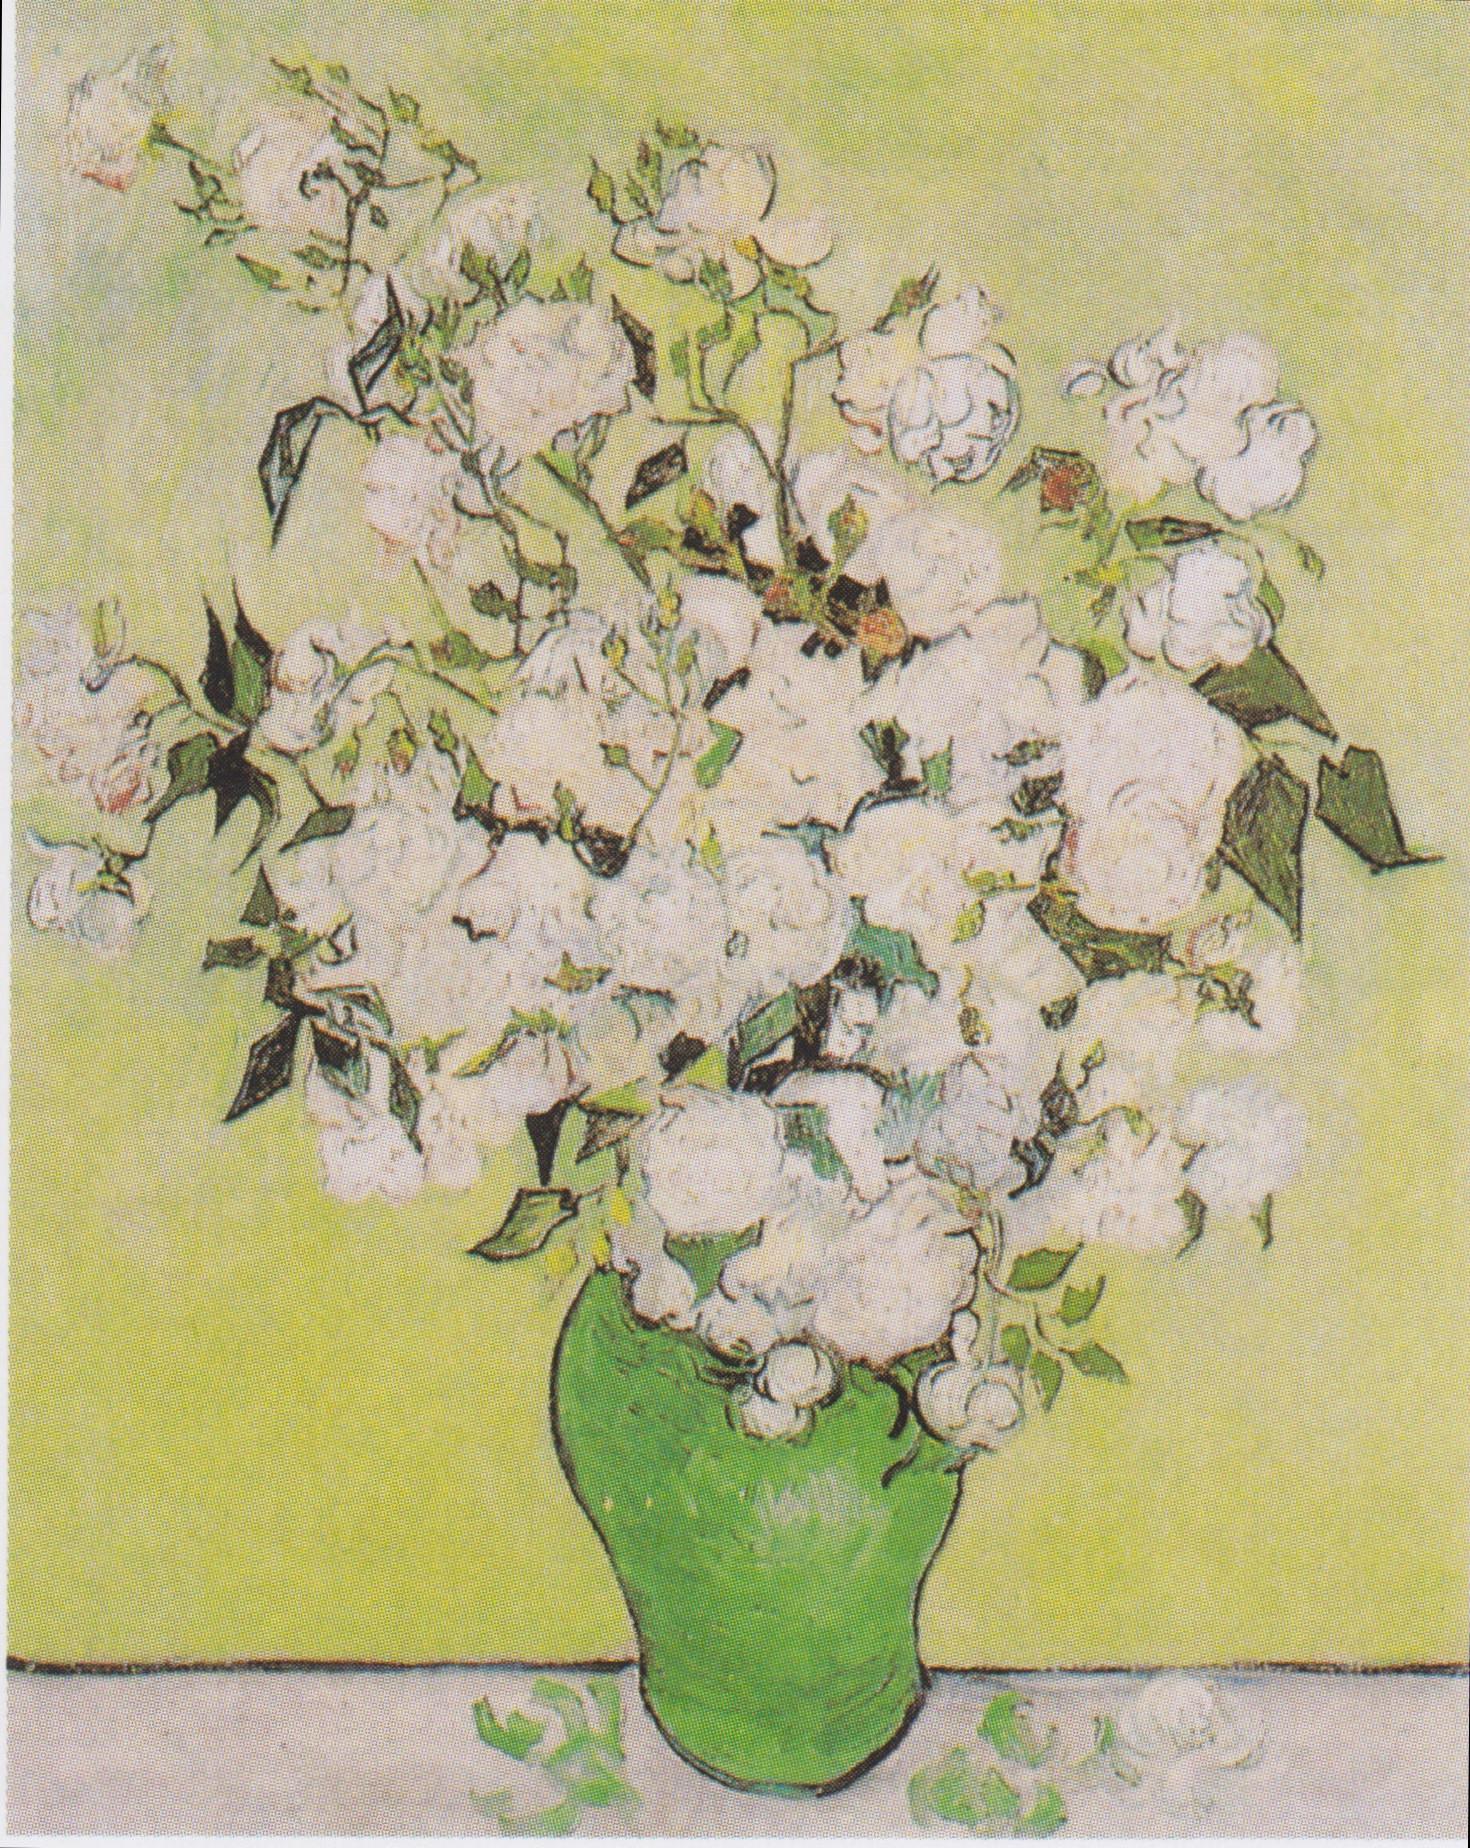 van gogh vase with flowers of plikvan gogh vase mit rosen1 wikipedia wolna encyklopedia intended for logo wikimedia commons